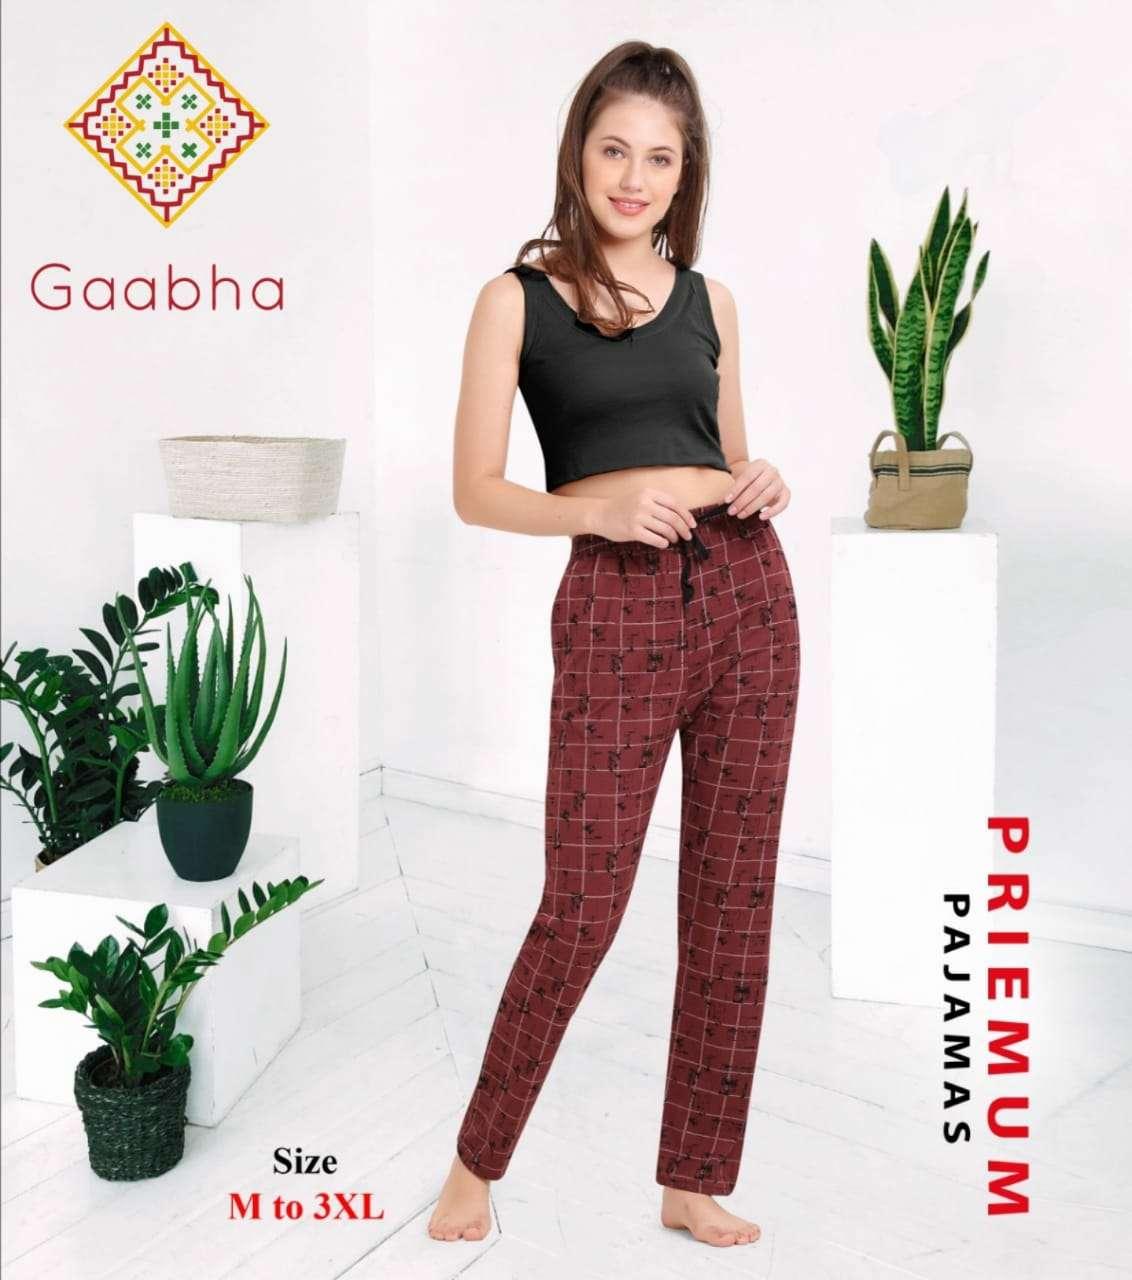 Gaabha Mercury Vol 2 Cotton Hosiery Night Wear Collection